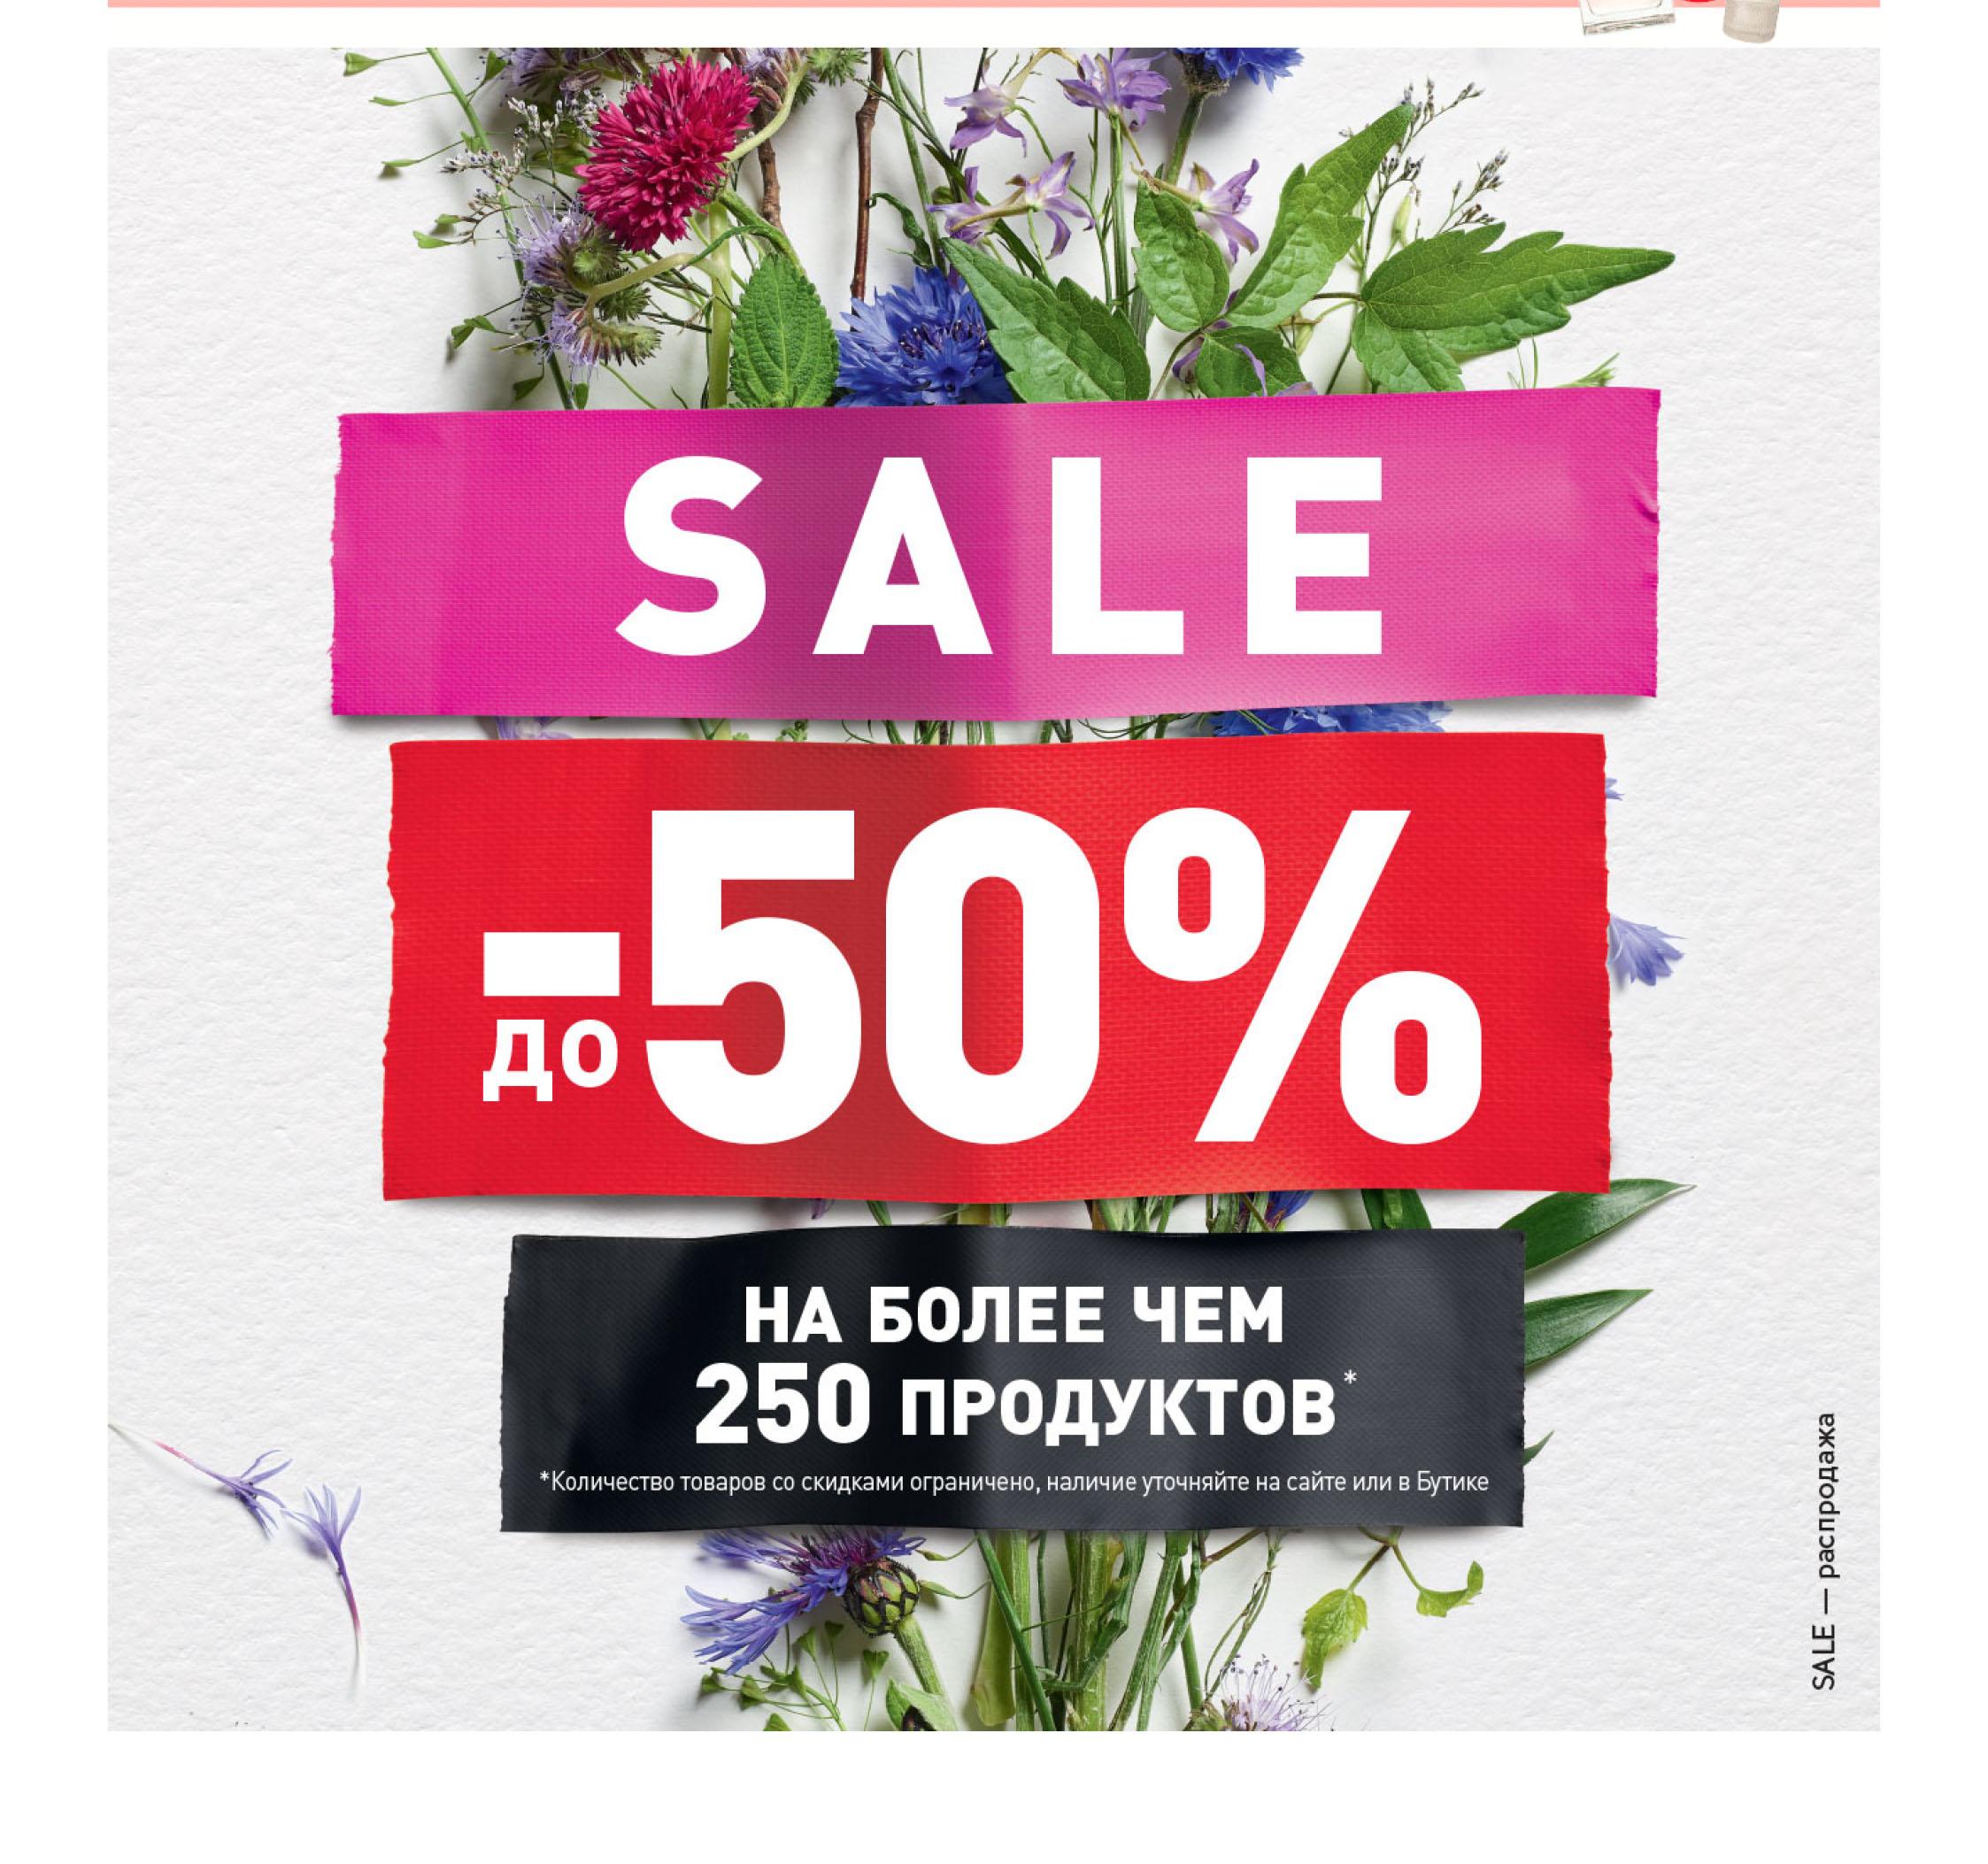 🍃Бутик Ив Роше дарит подарки и скидки до 50%